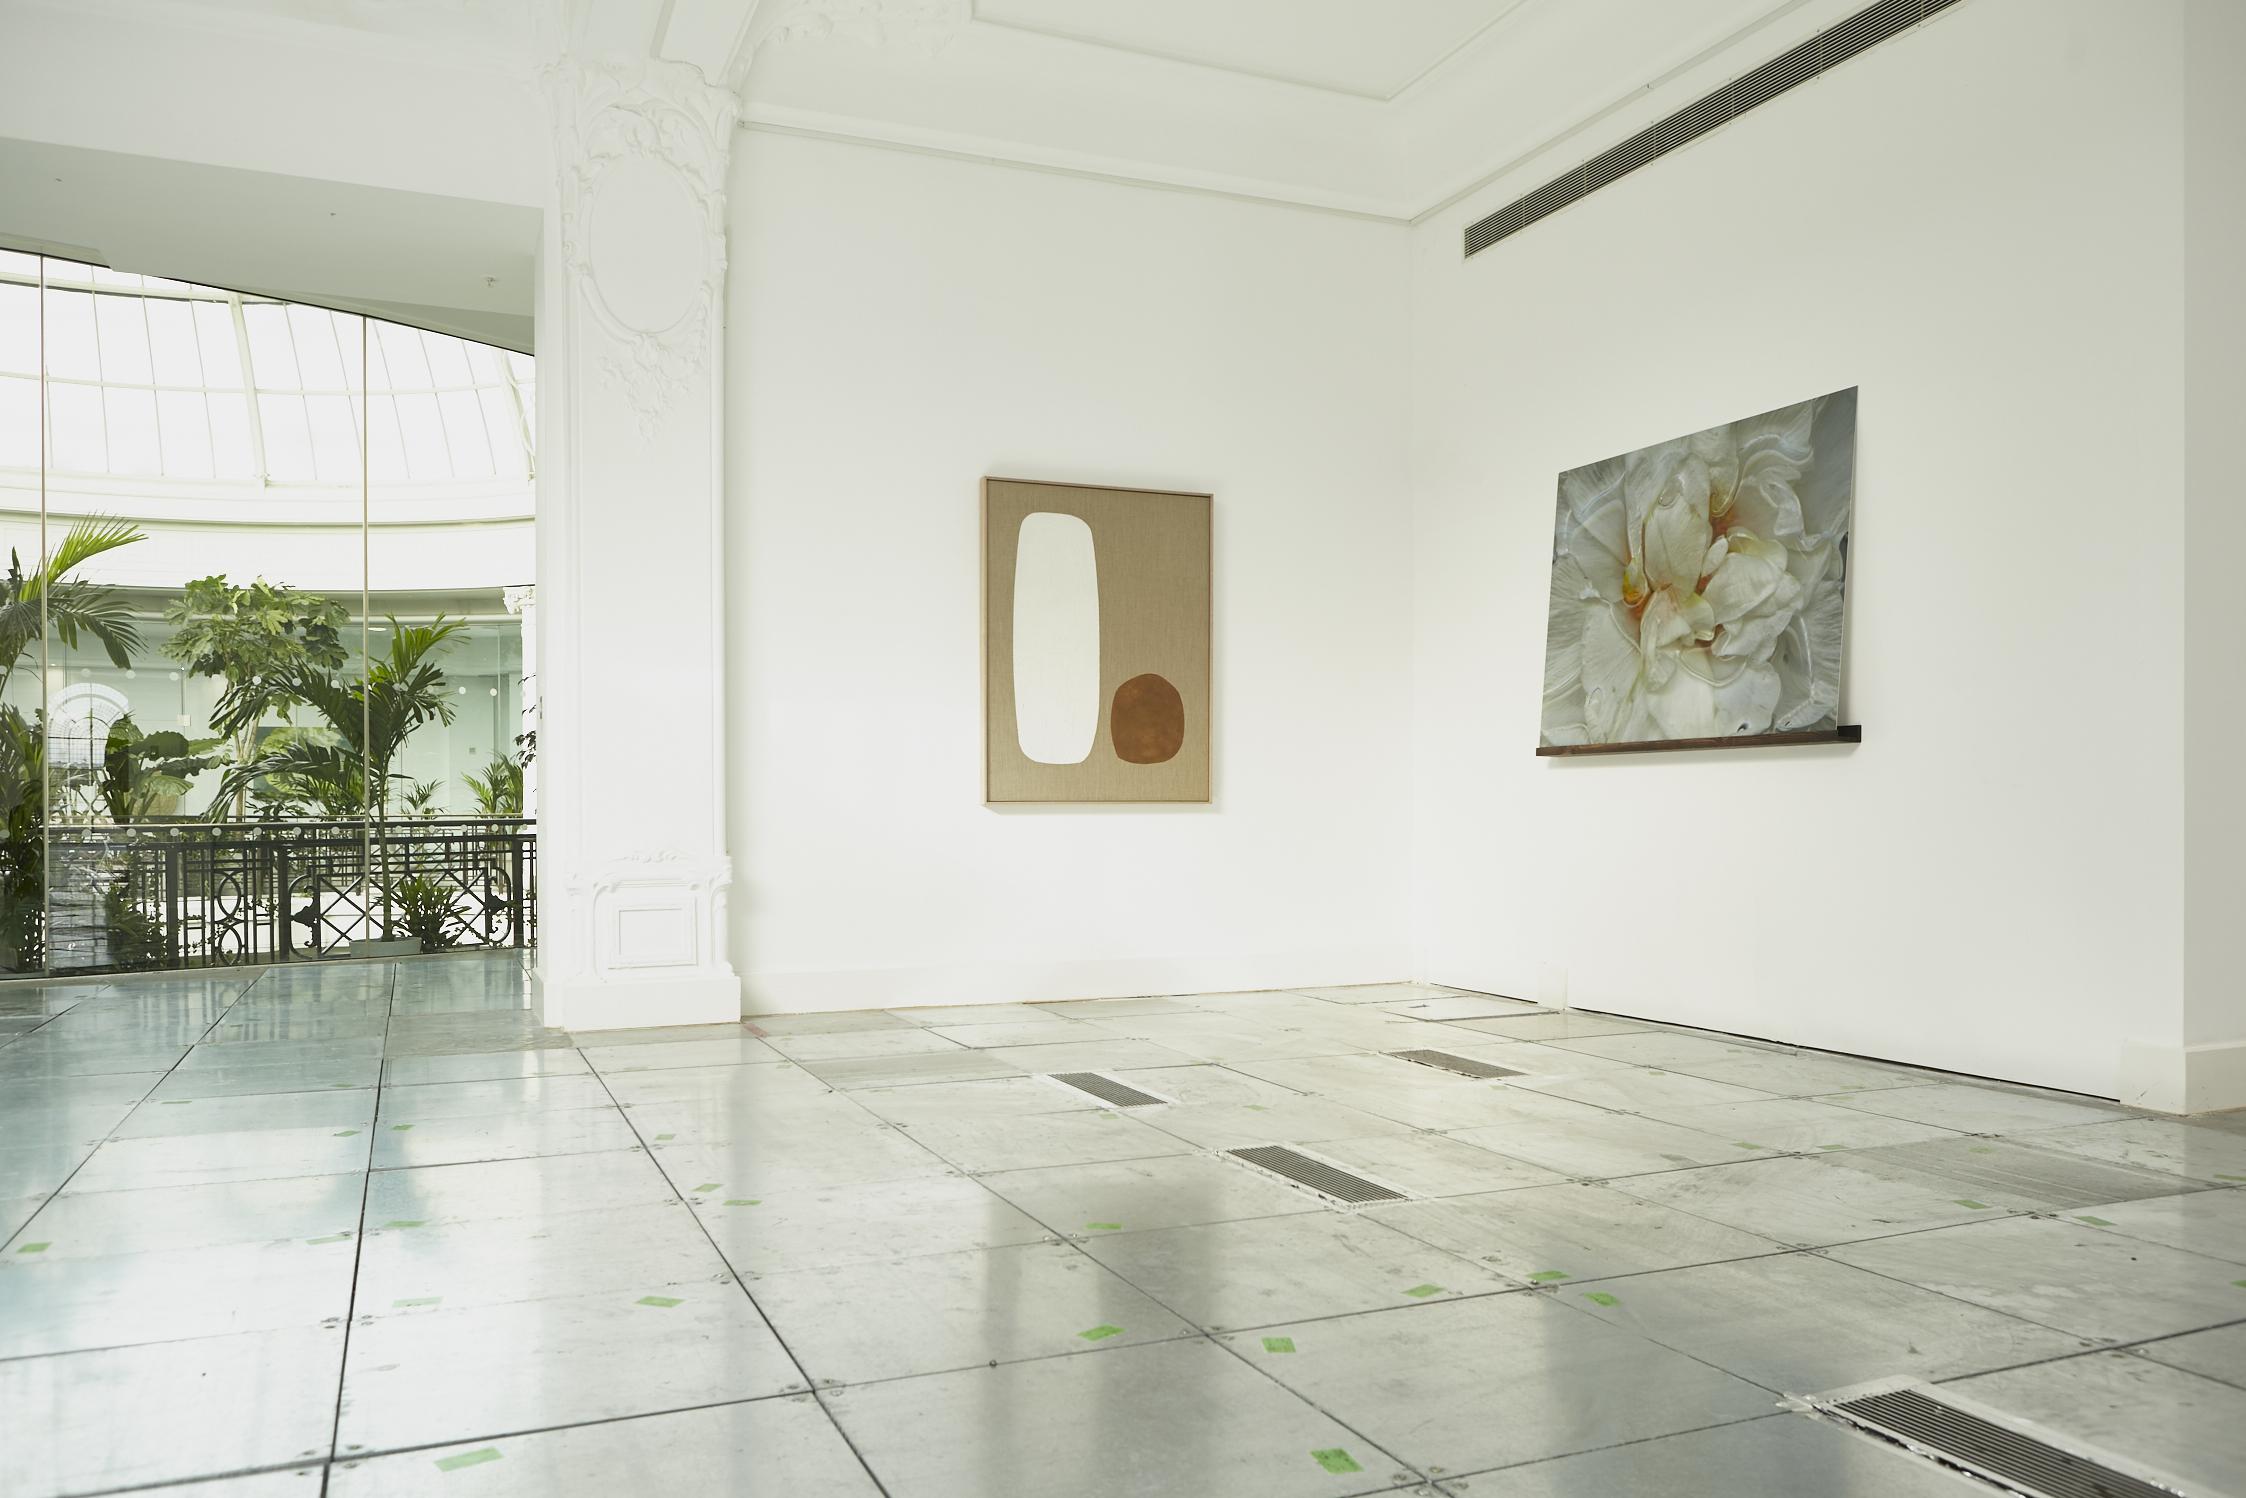 anna-skladmann-2018_2_20_openspace_gallery_grace_exhibtion__MG_0105+1.jpg